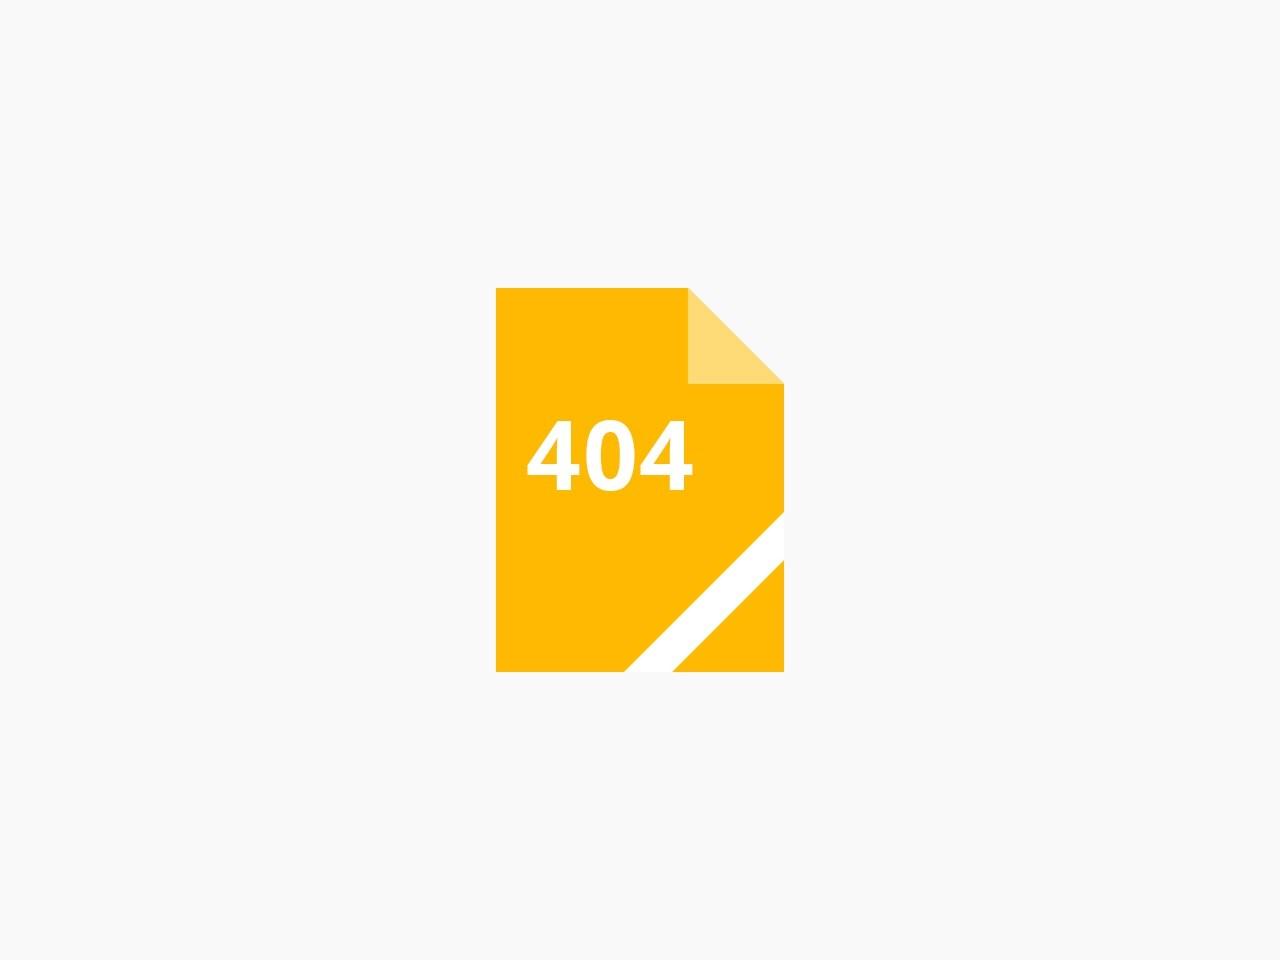 babytopz.com